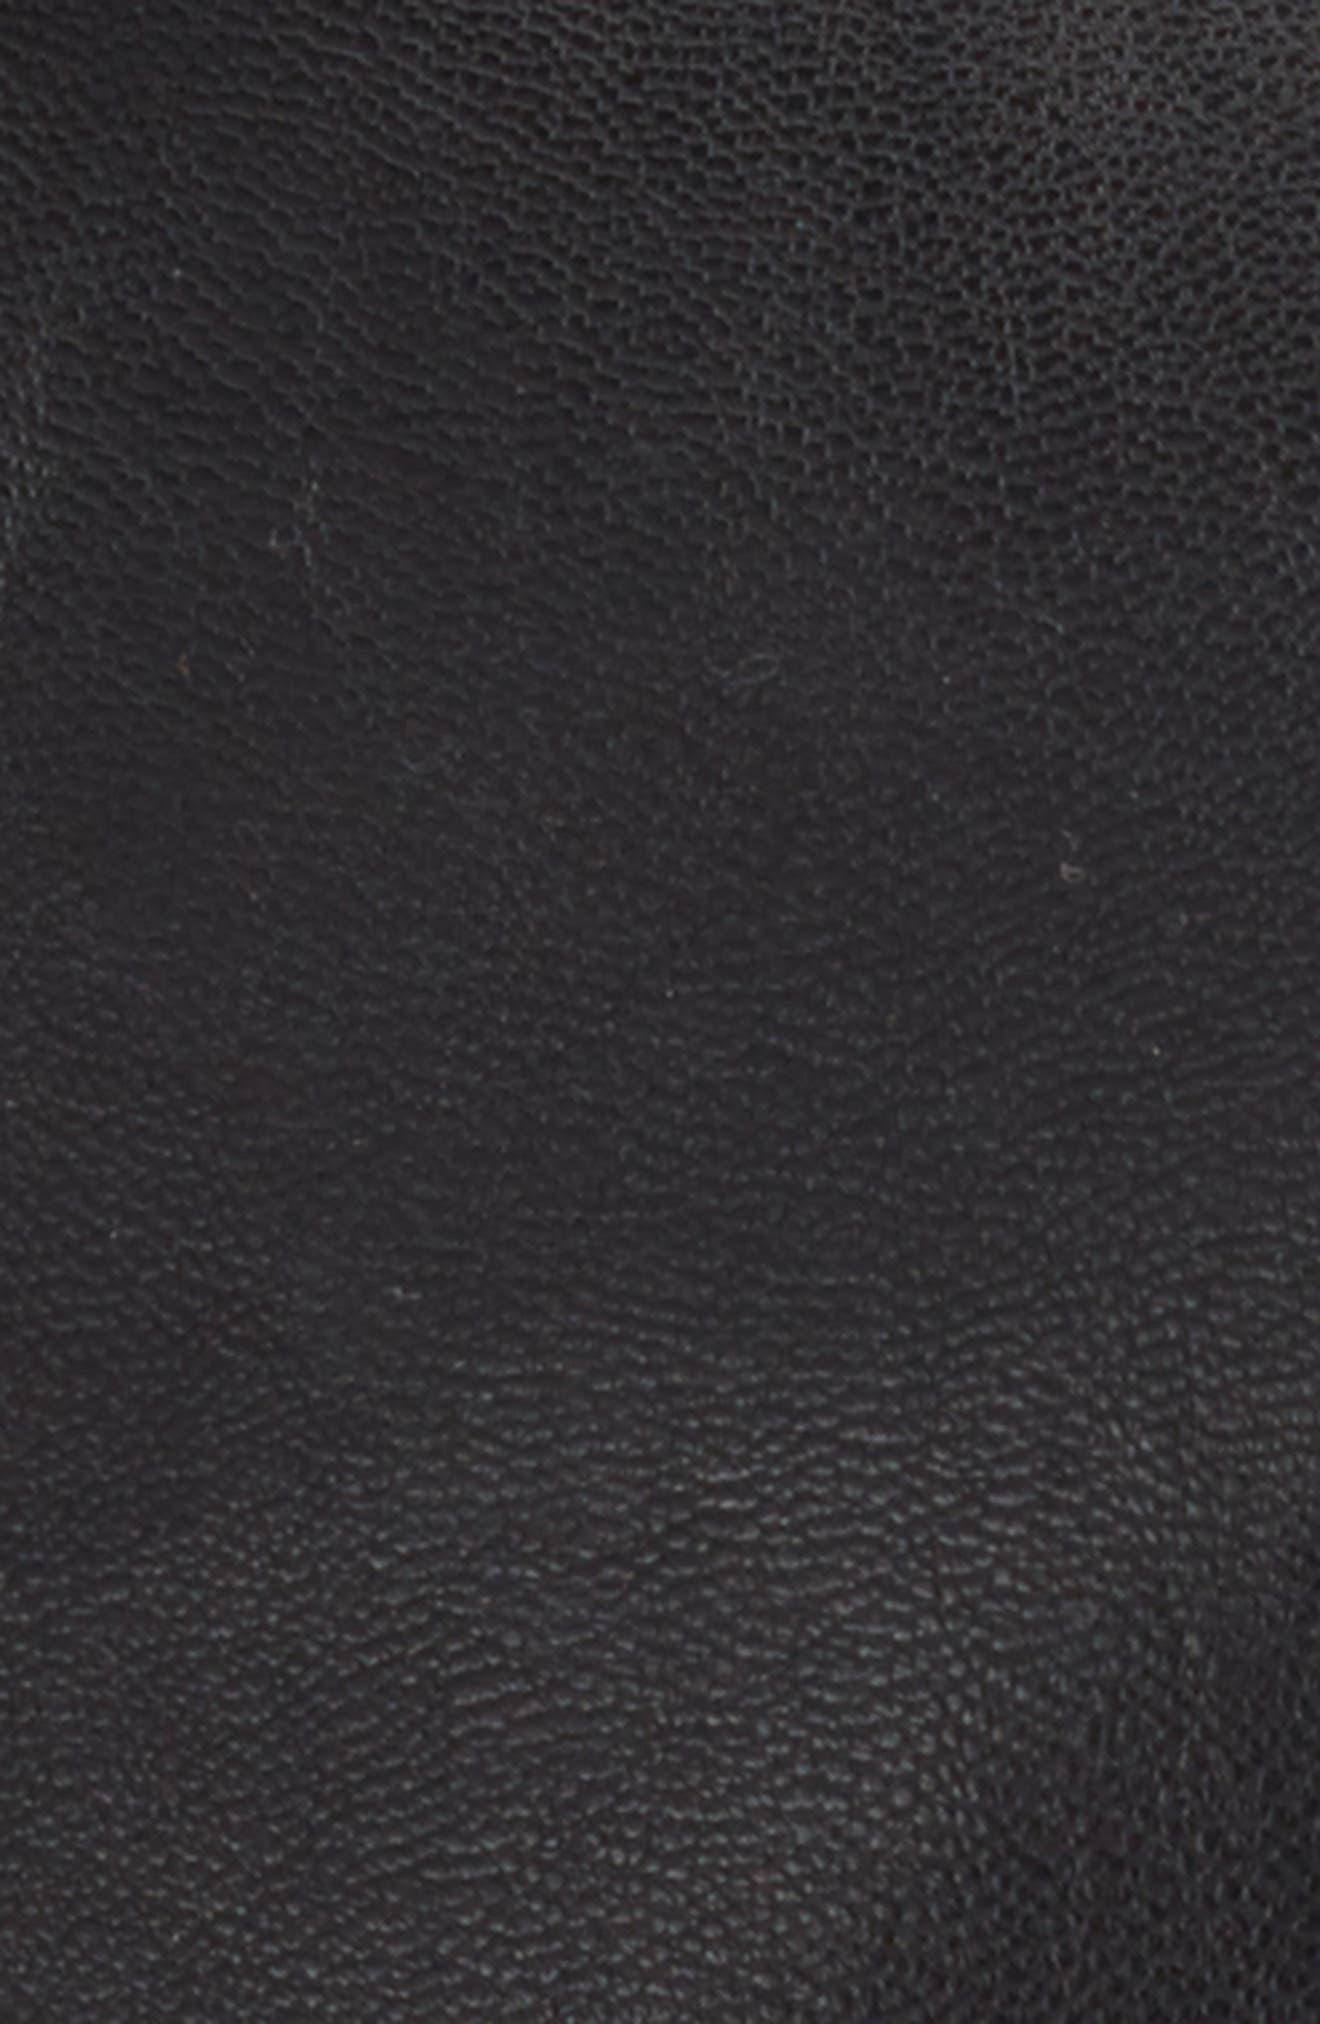 PHASE 3,                             Faux Leather Baseball Cap,                             Alternate thumbnail 2, color,                             001